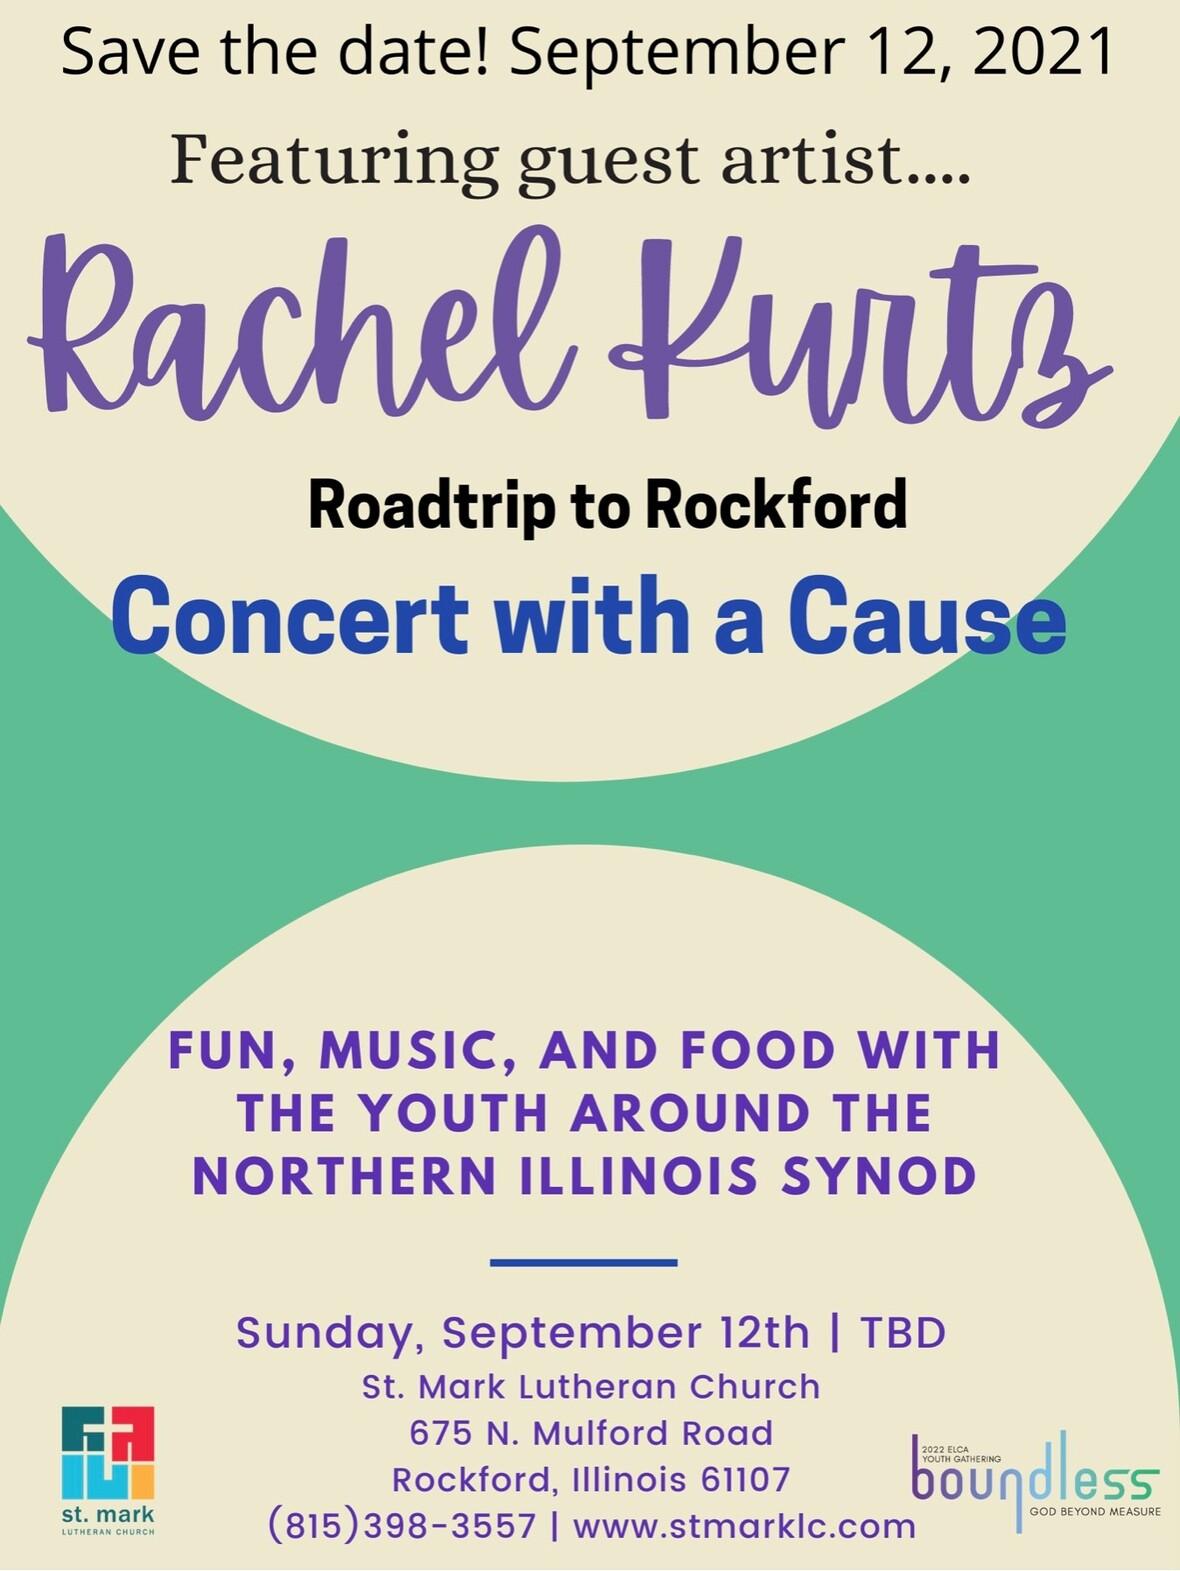 Rachel Kurtz concert Sept 12